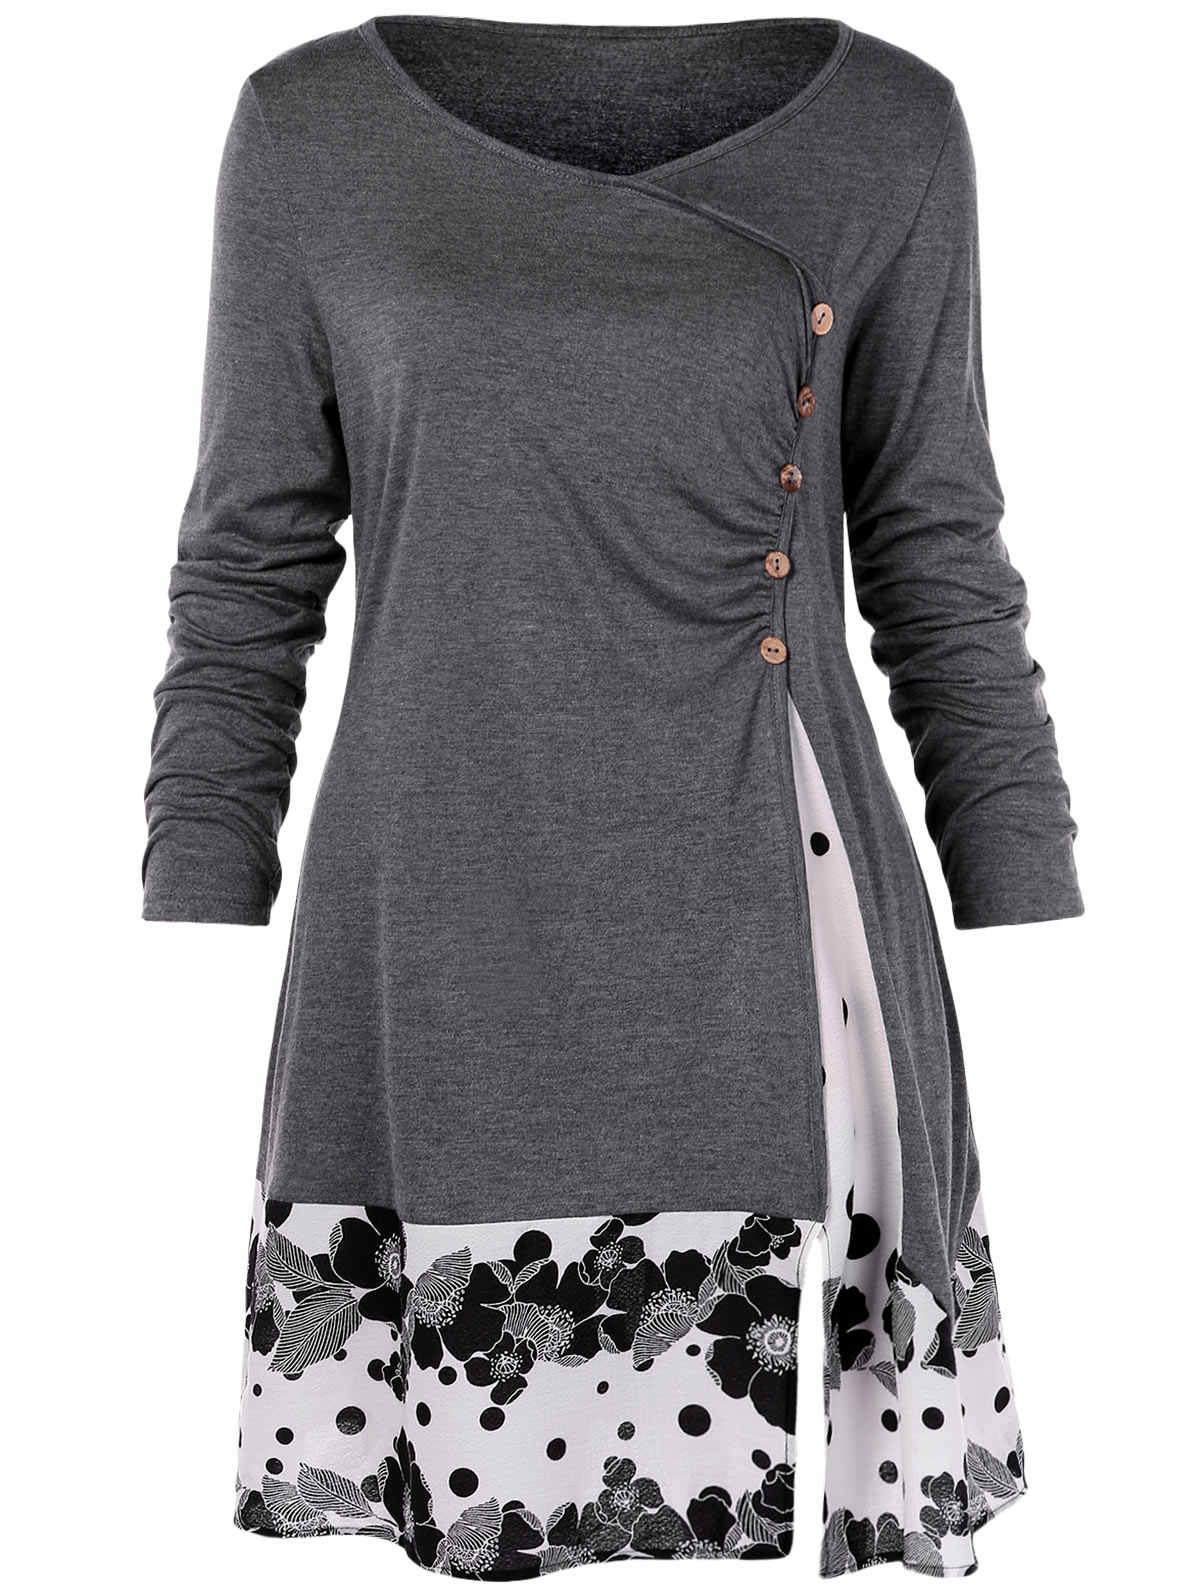 Wipalo PLUS ขนาด Draped ดอกไม้ Tunic เสื้อยืด Scoop คอยาวแขนยาวปุ่ม Embellished Casual ฤดูใบไม้ร่วงผู้หญิง TEE ขนาดใหญ่ด้านบน 5XL